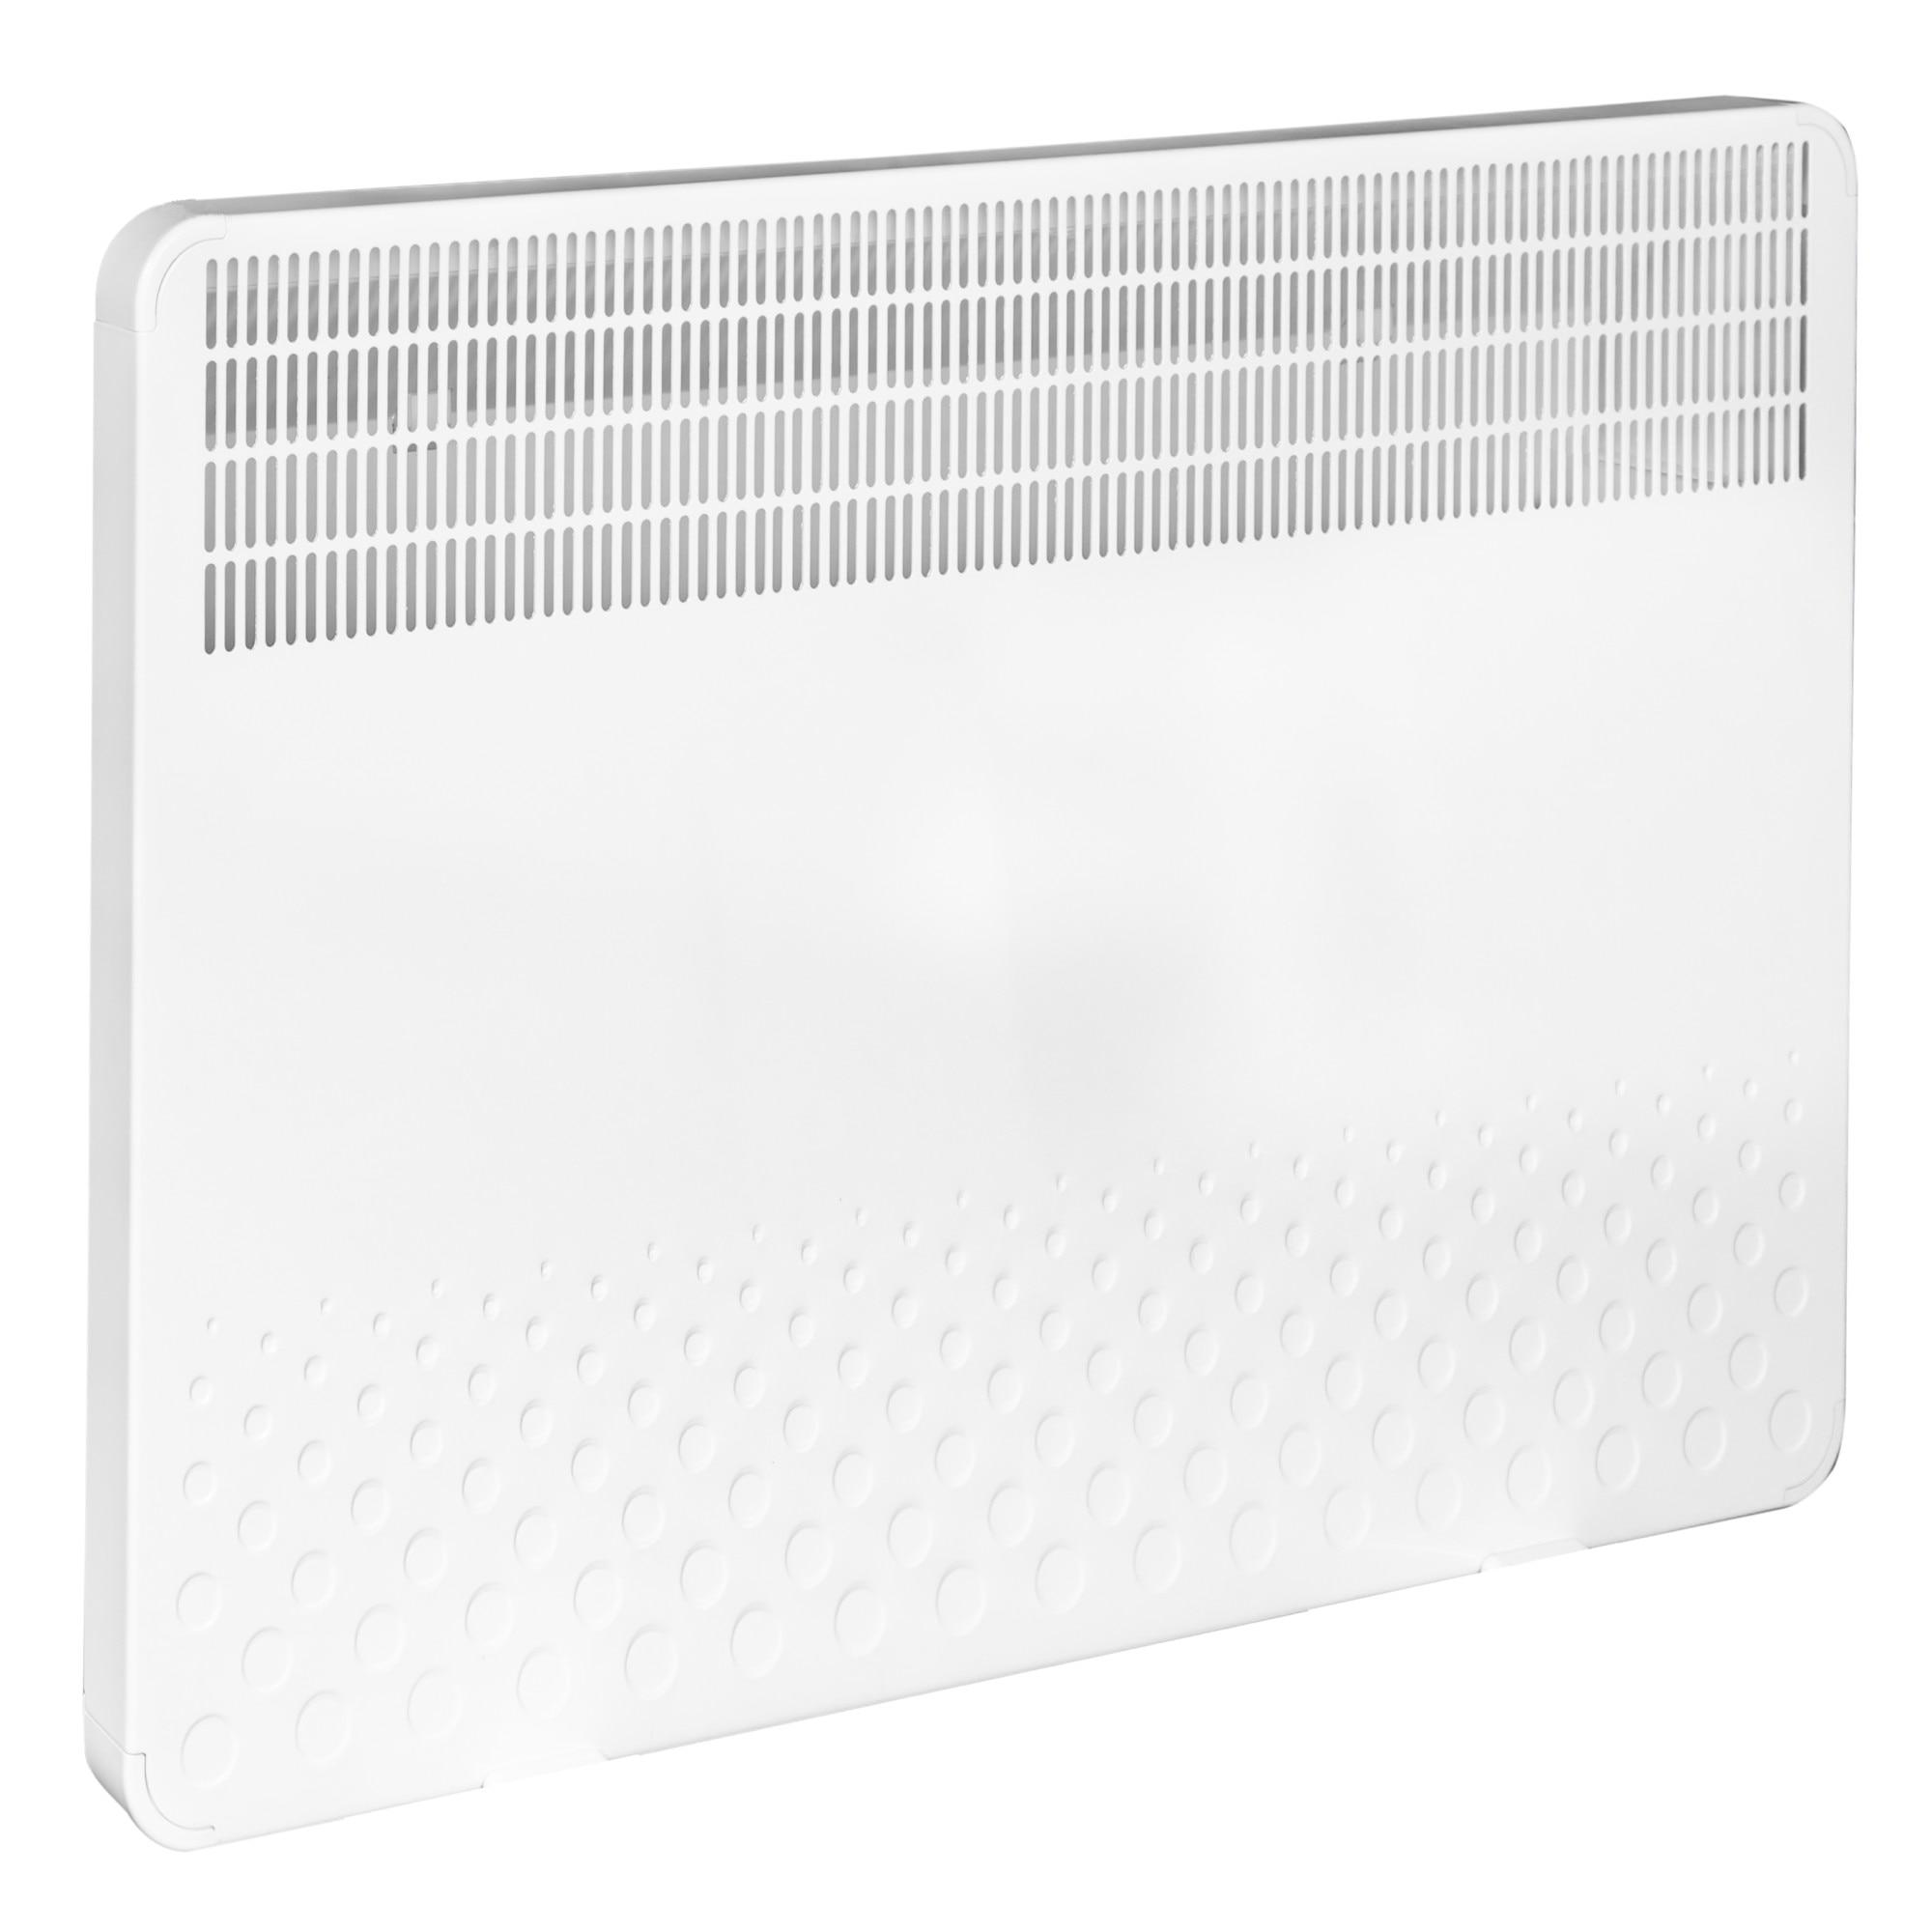 Fotografie Convector digital electric de perete si pardoseala Solaris KIP 1000 W, control electronic, Termostat de siguranta, termostat reglabil, IP 24, ERP 2018, pana la 12 m, display digital